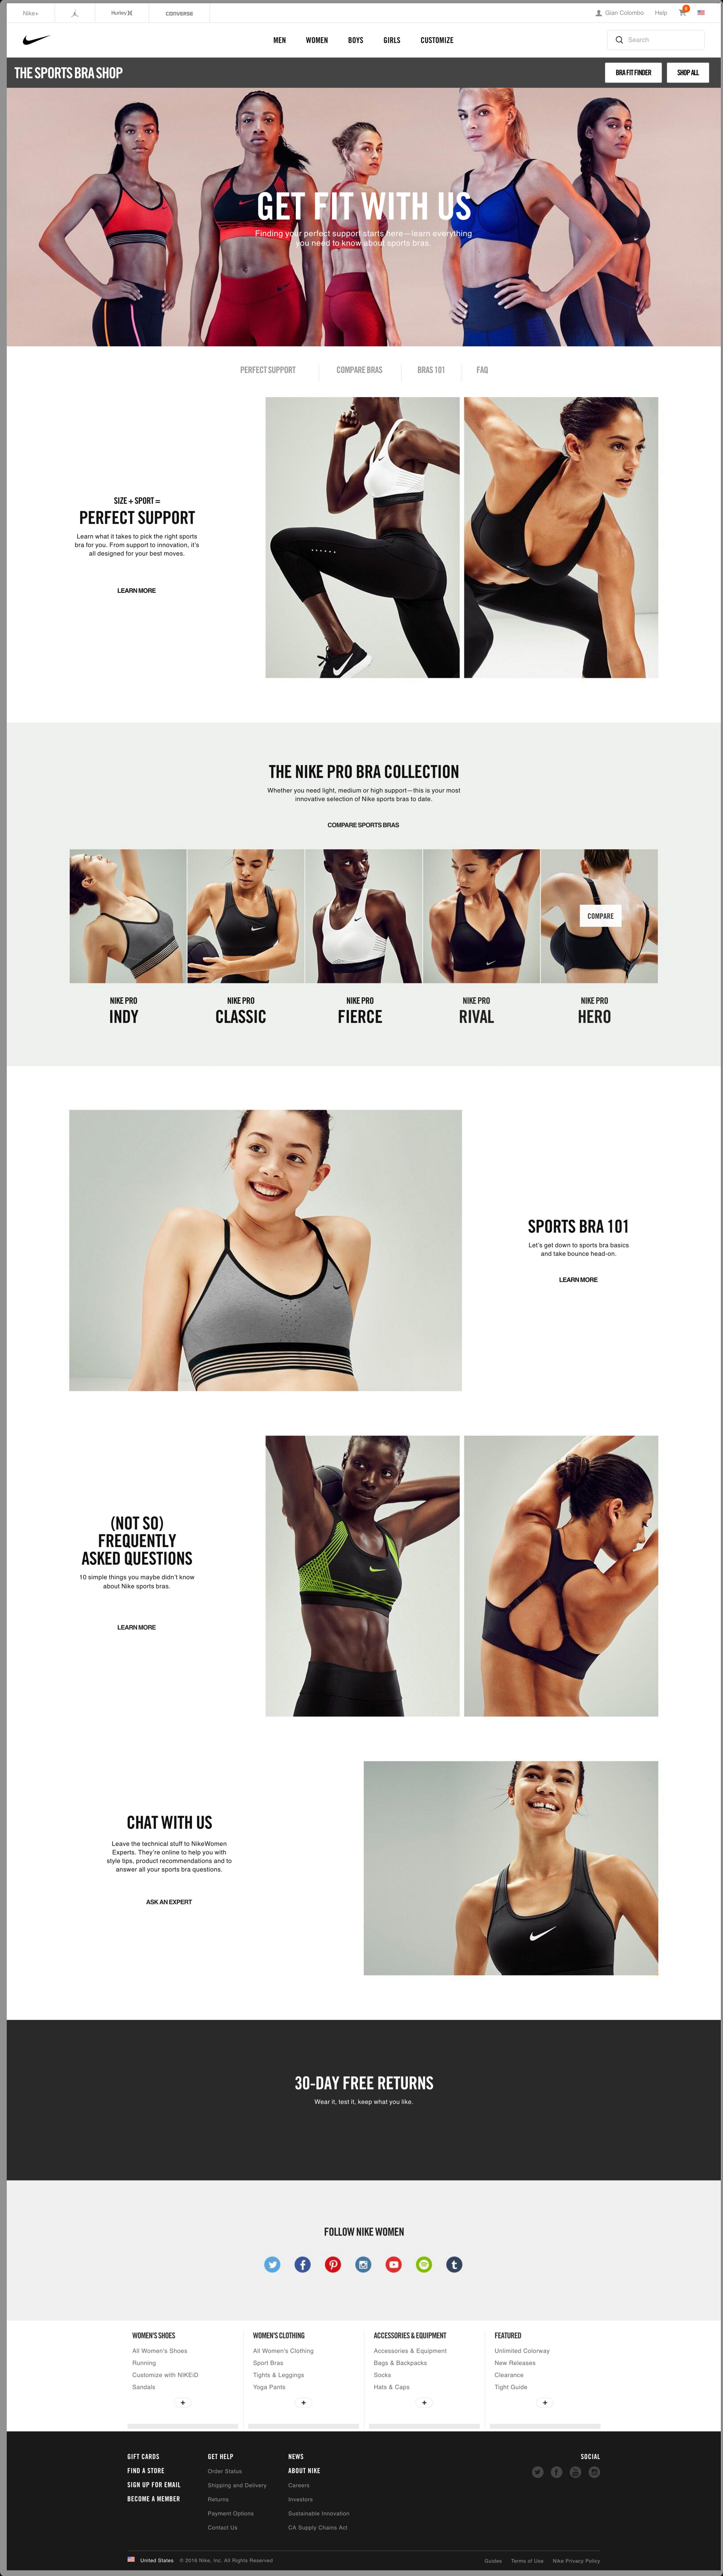 Nike Sports Bra Boutique: Online Shop